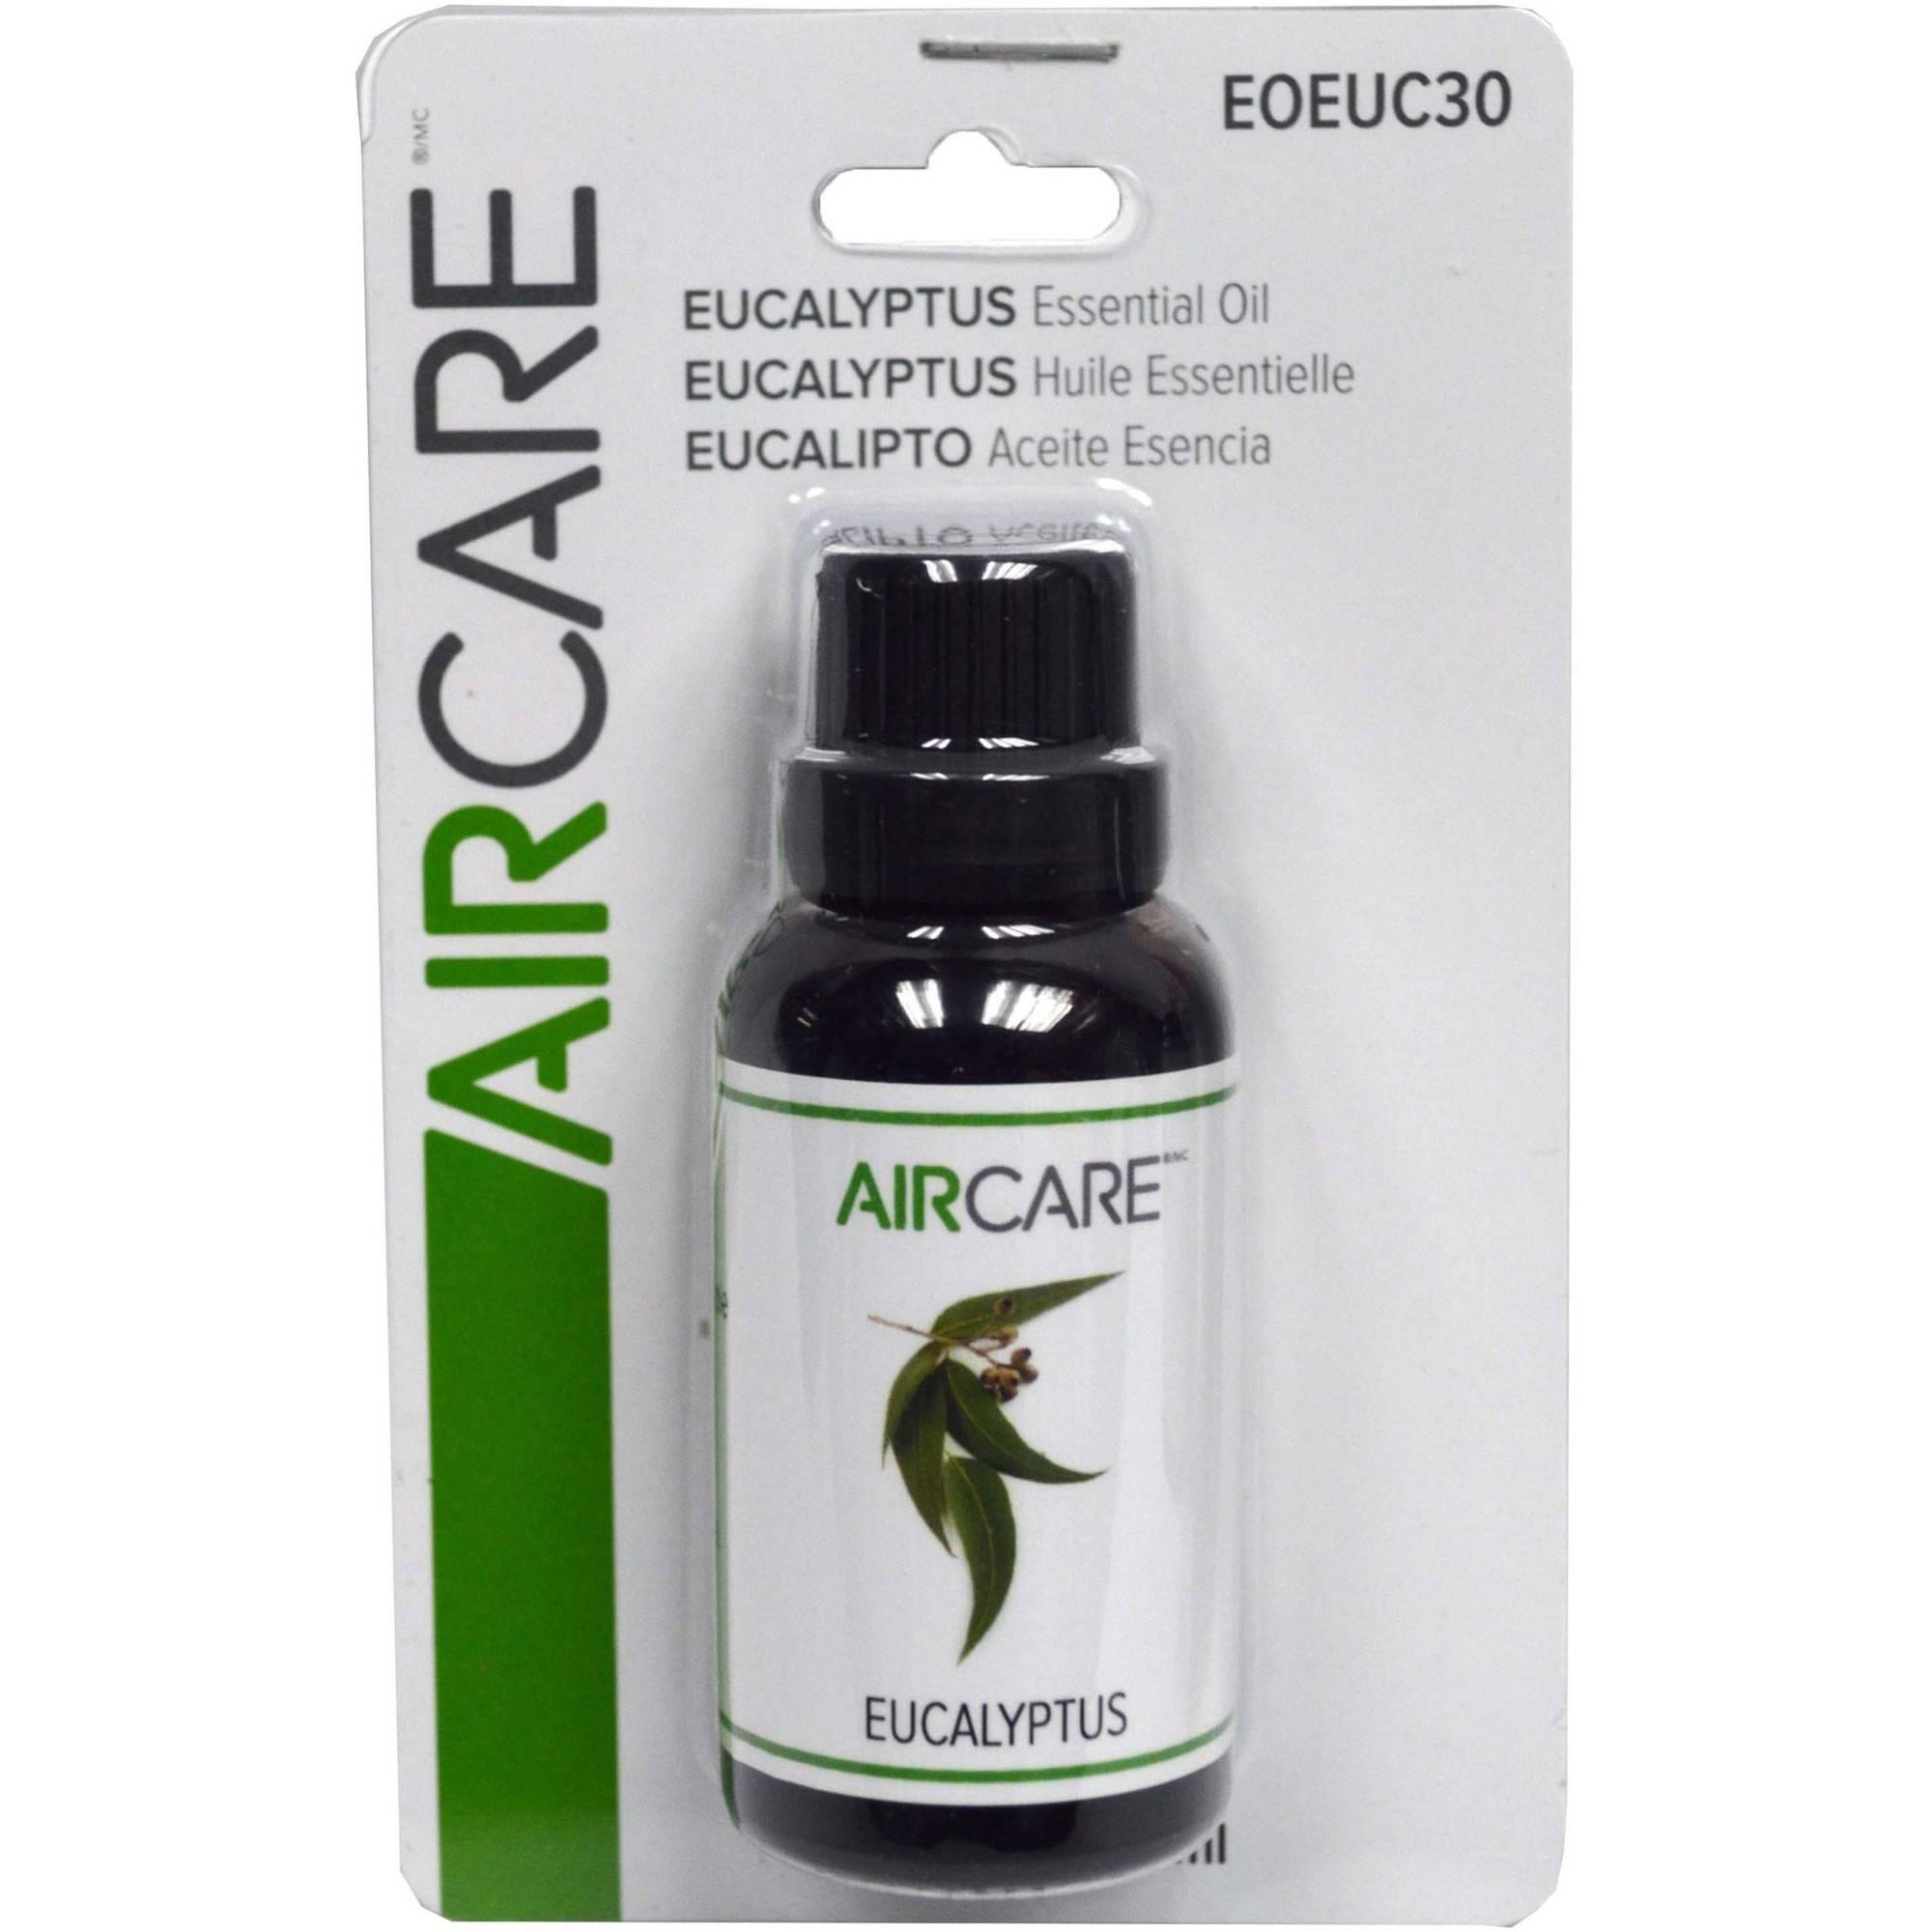 AIRCARE EOEUC30 Eucalyptus Essential Oil (30ml bottle)